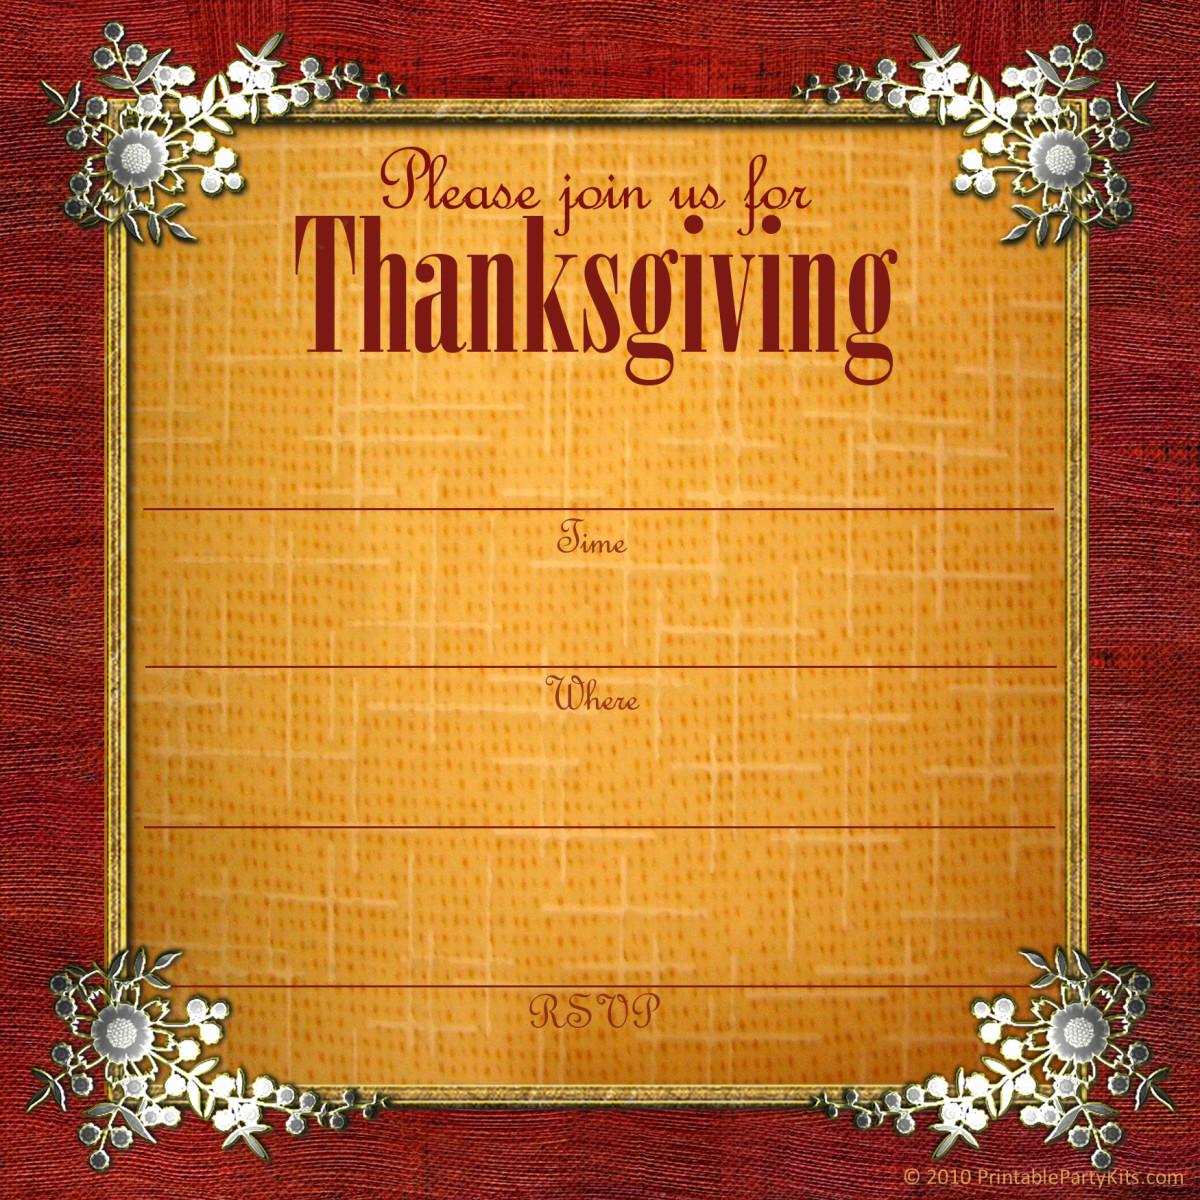 Sterling silver embellishments digital Thanksgiving invitation